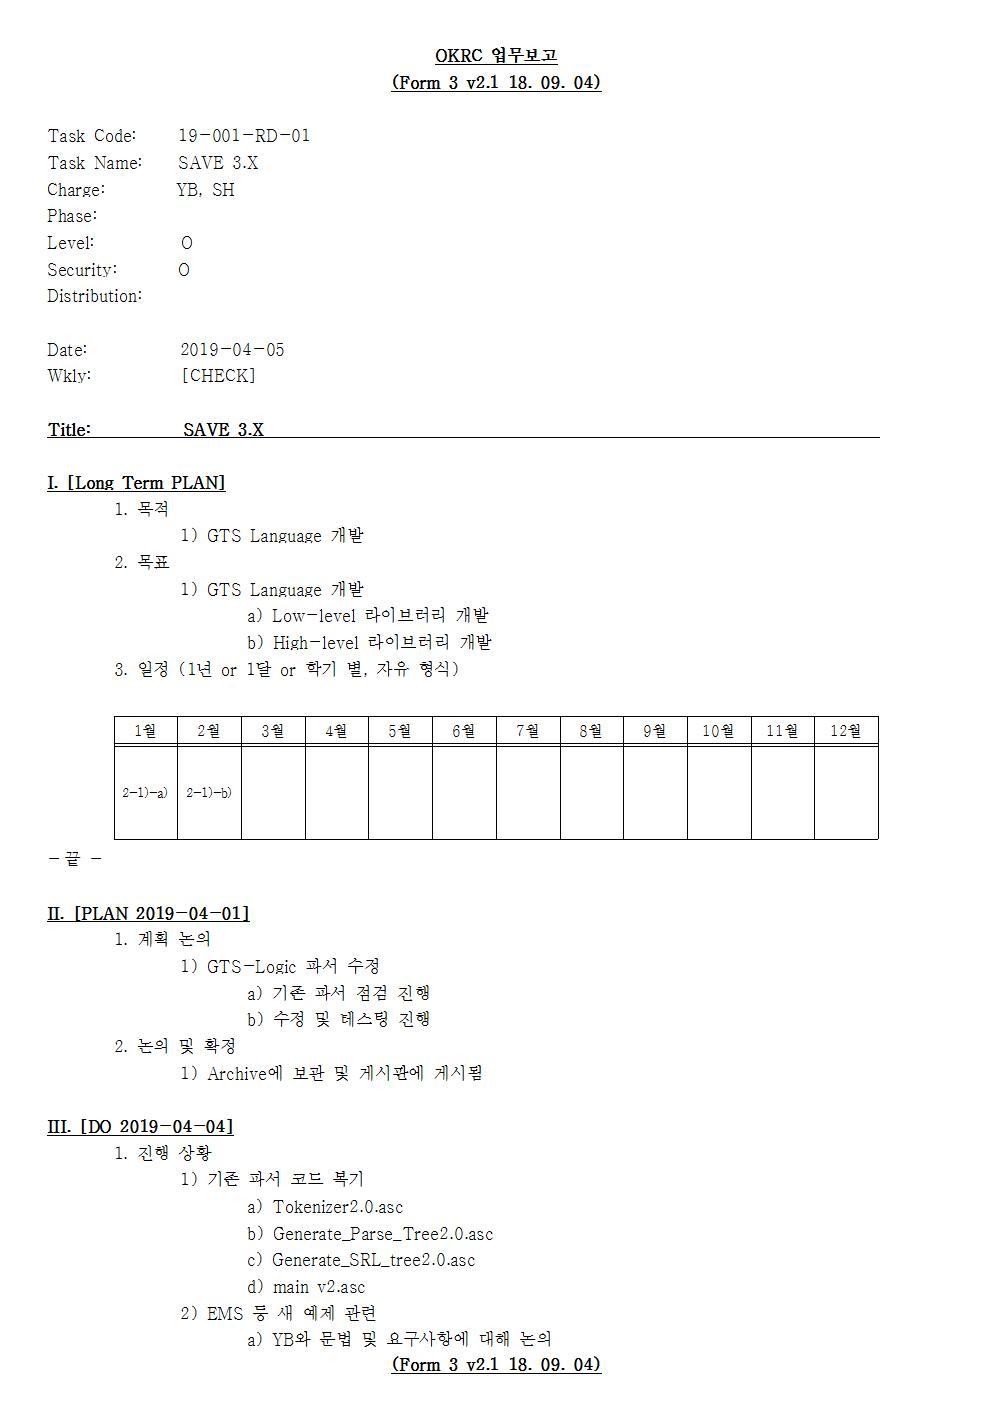 D-[19-001-RD-01]-[SAVE 3.X]-[2019-04-05][SH]001.jpg